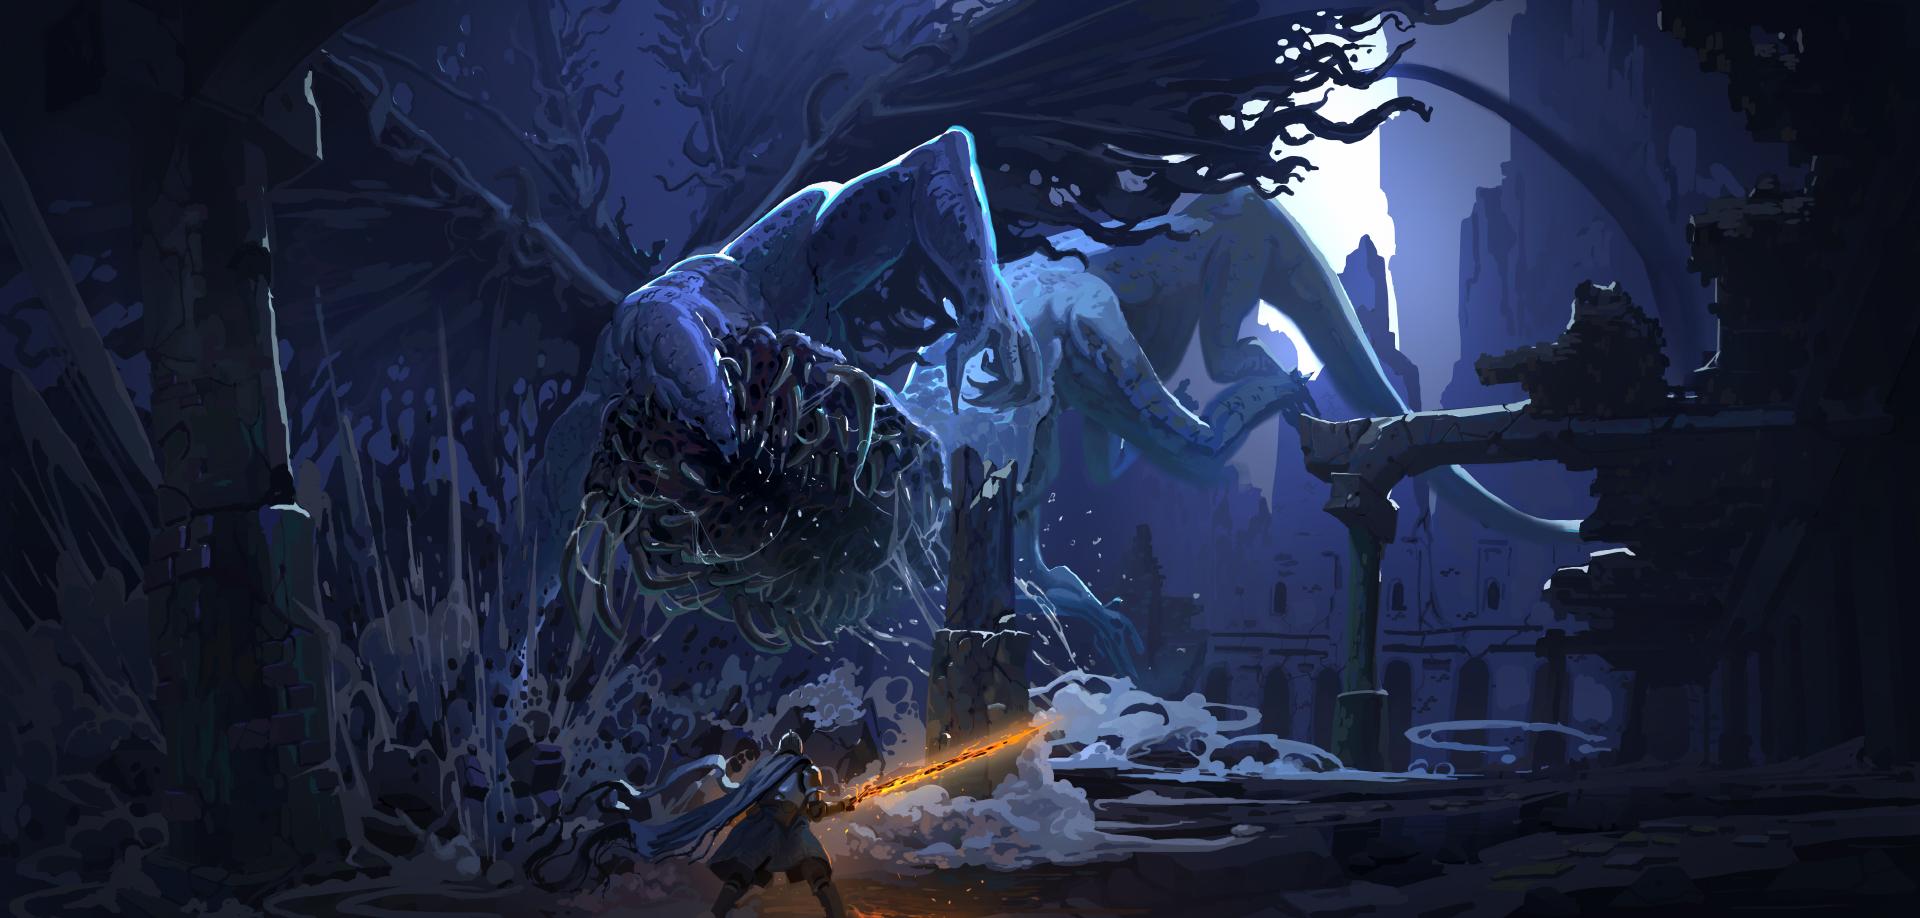 dark souls 1 gaping dragon by onestepart on deviantart